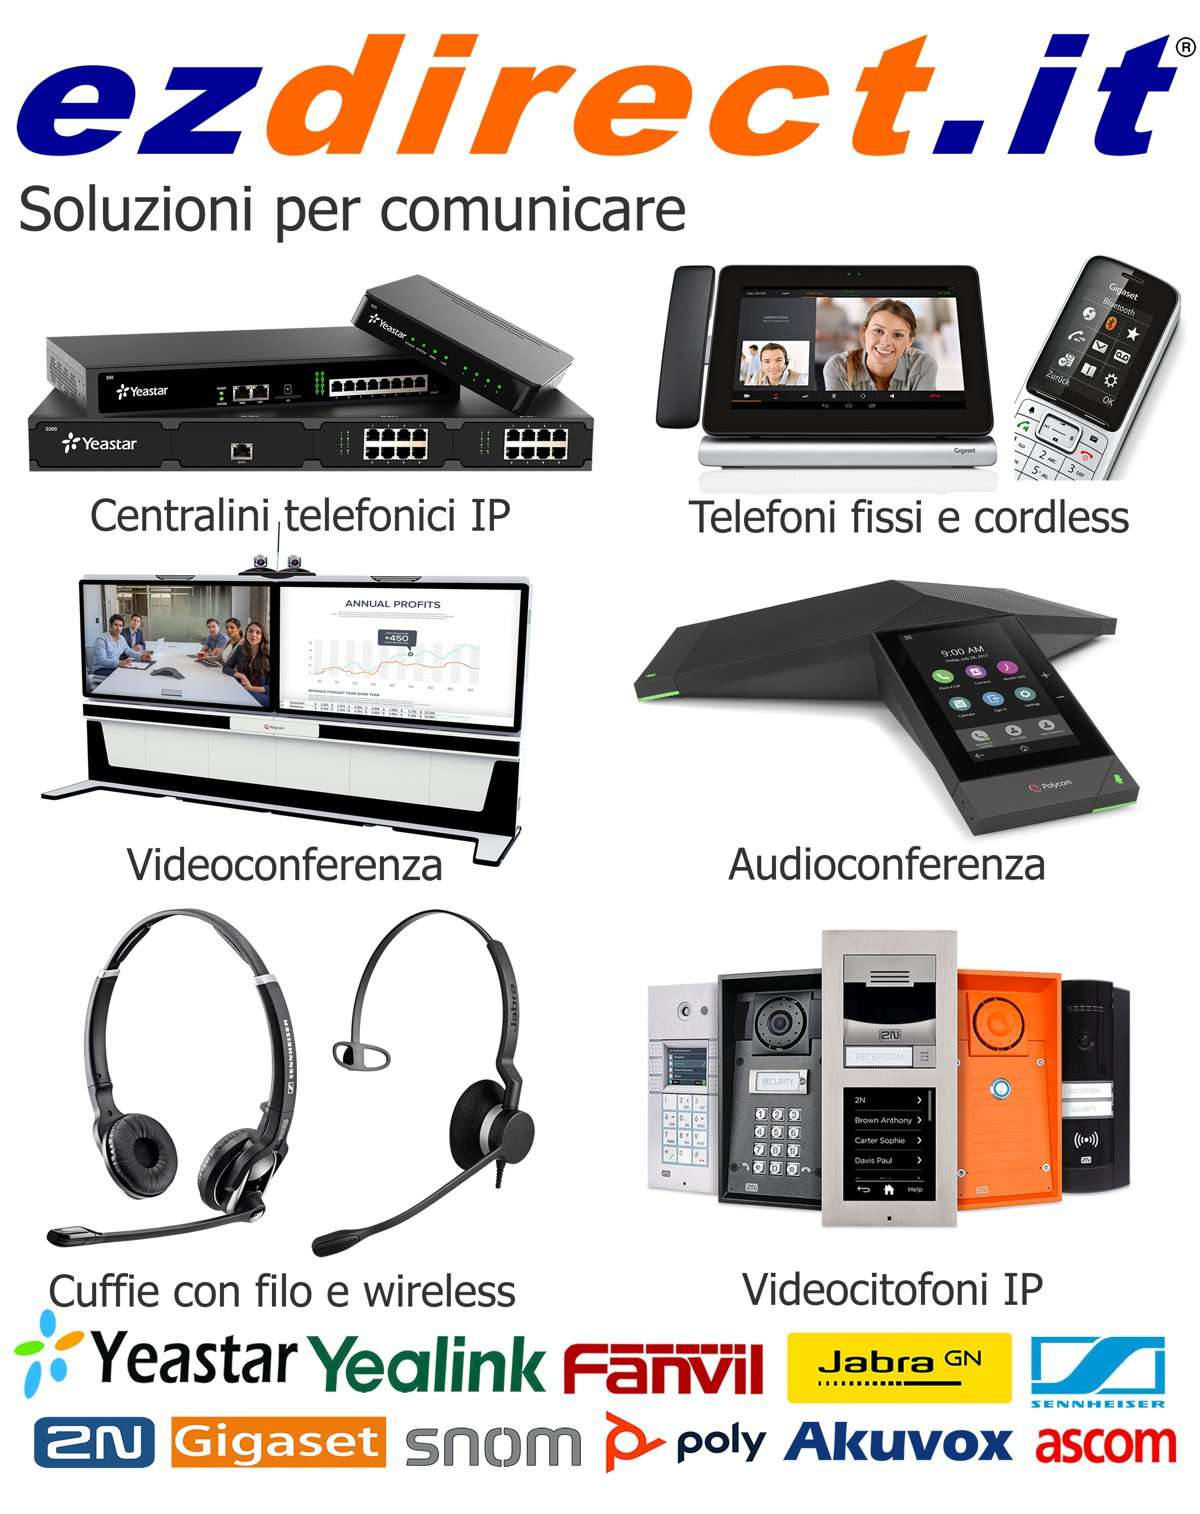 Ezdirect: tutti i servizi per la Unified Communication